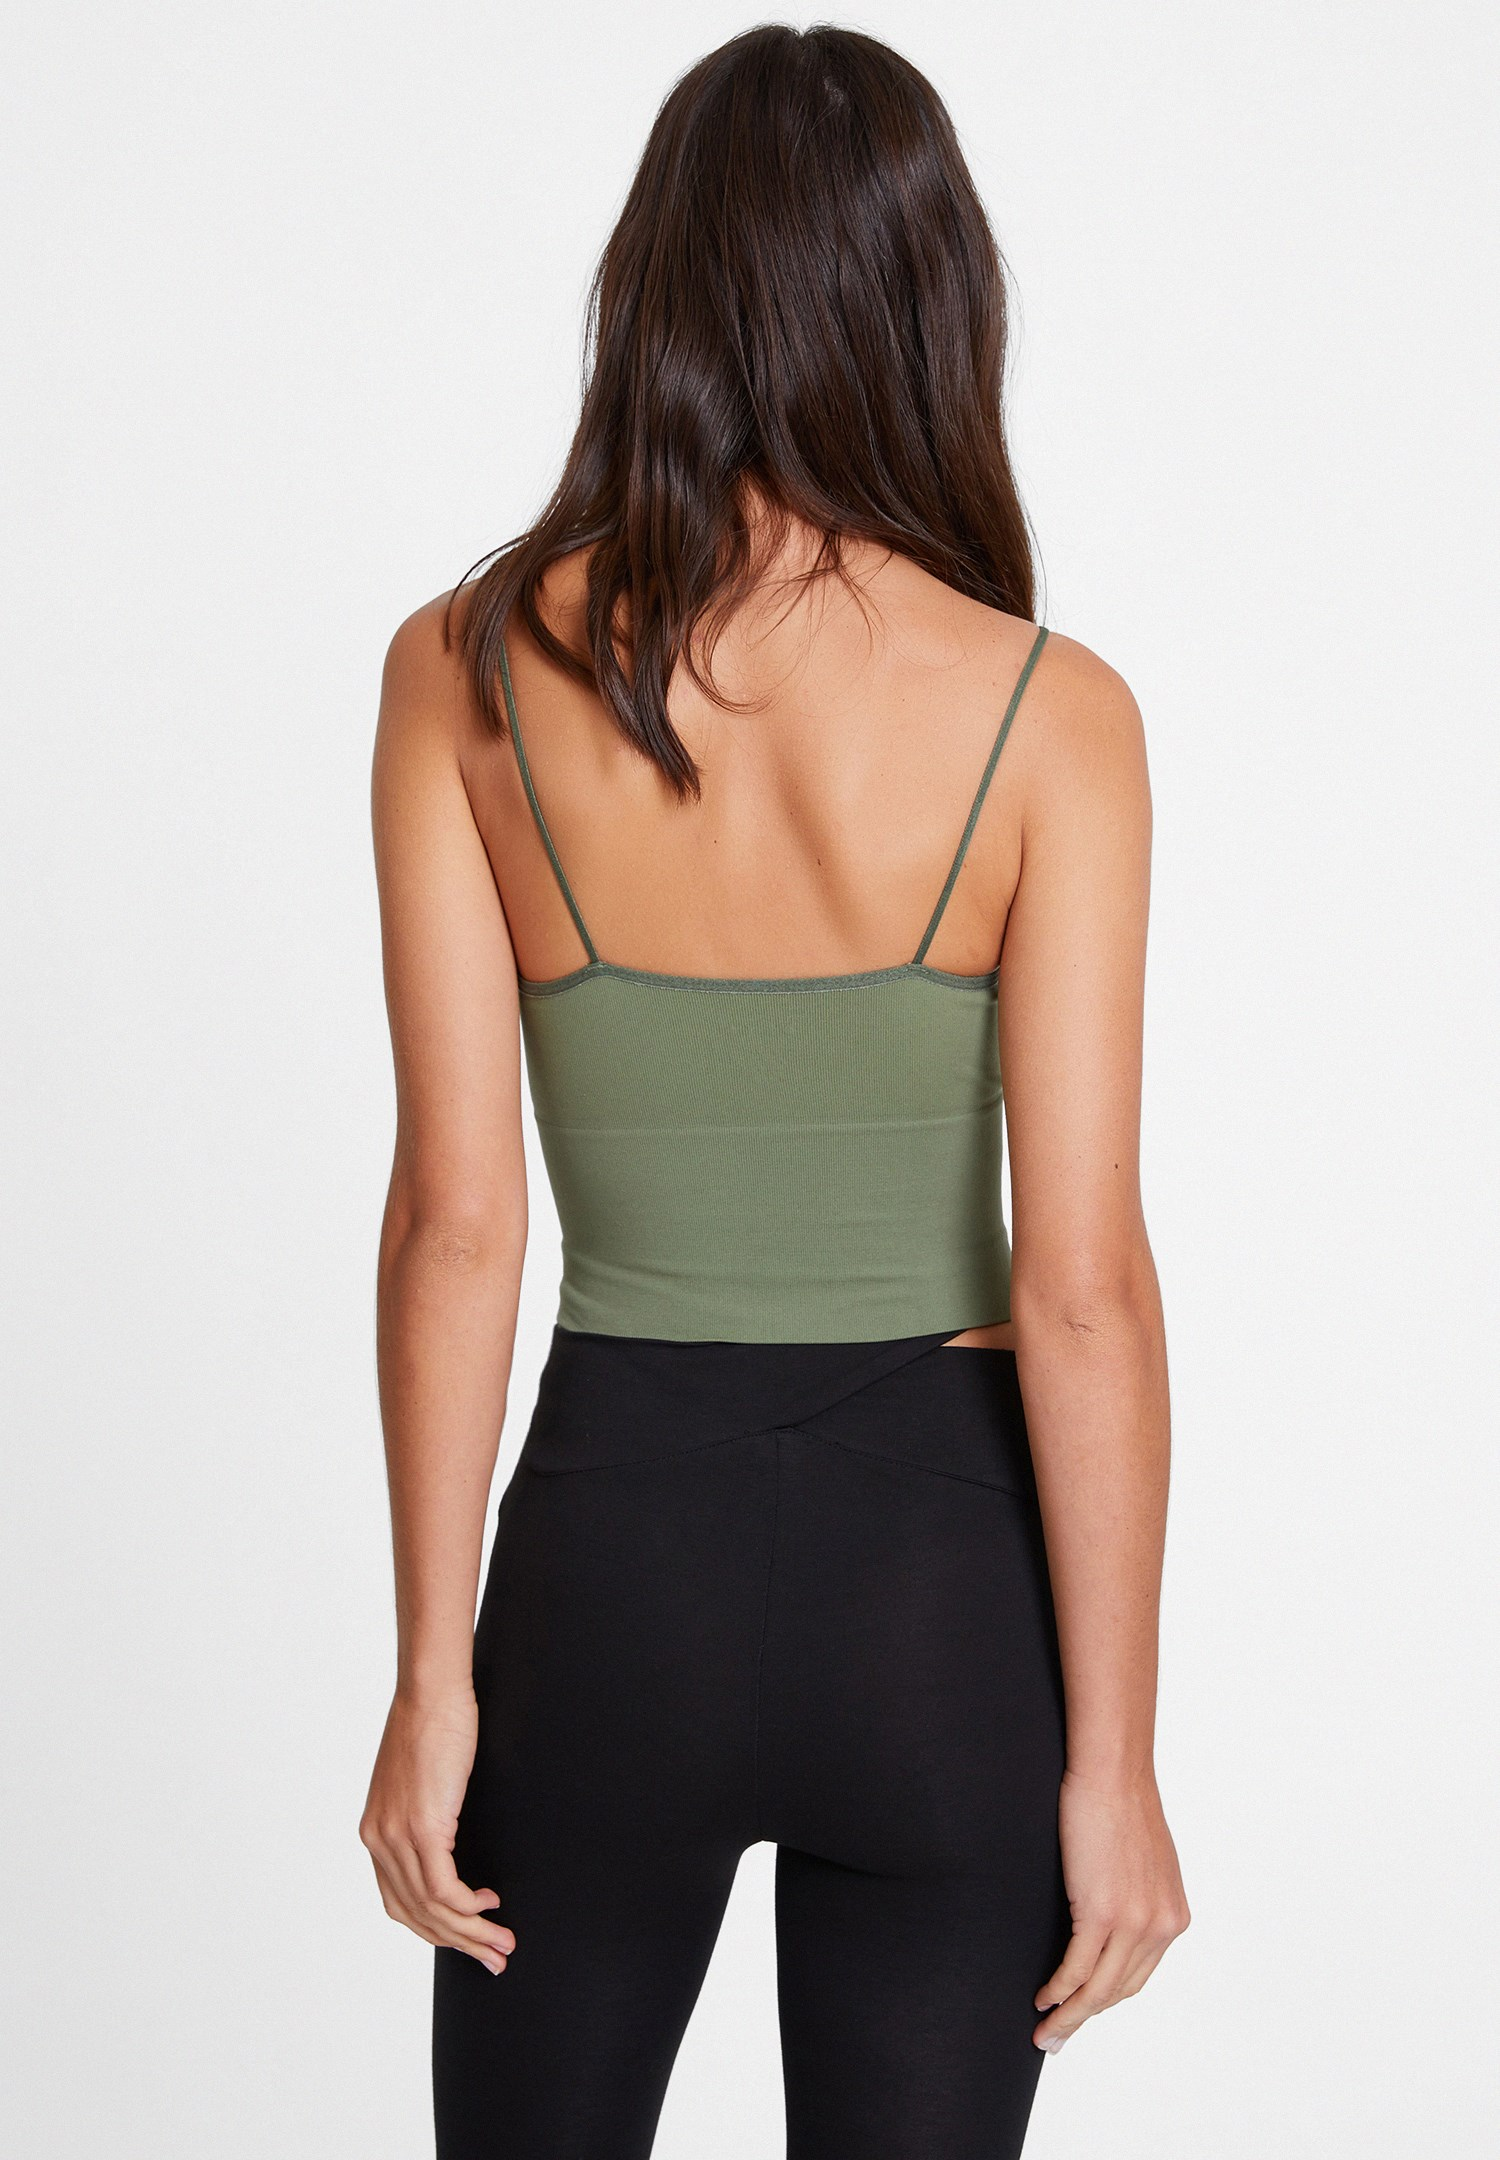 Bayan Yeşil İnce Askılı V Yaka Crop Top